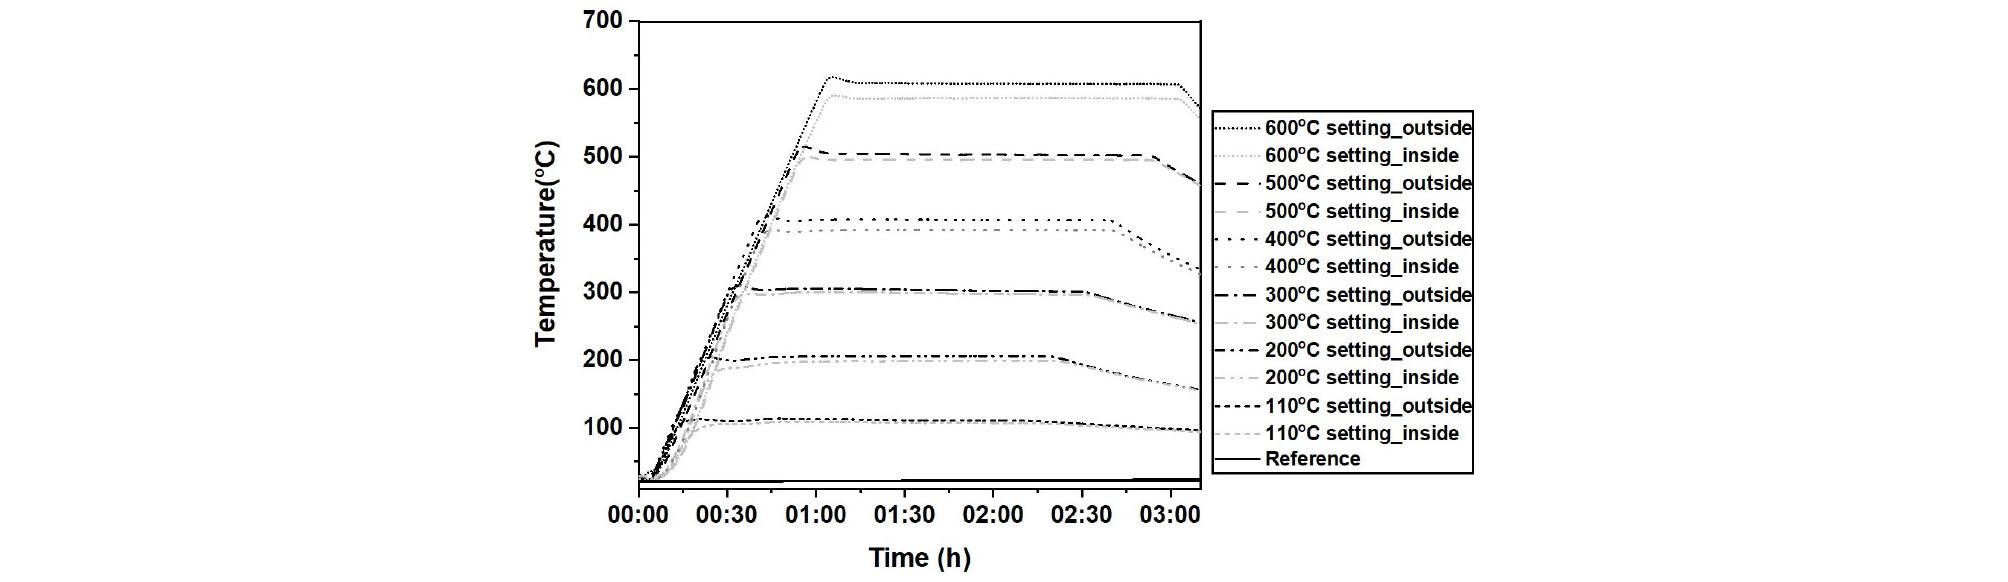 http://static.apub.kr/journalsite/sites/ksce/2020-040-01/N0110400106/images/Figure_KSCE_40_01_06_F5.jpg